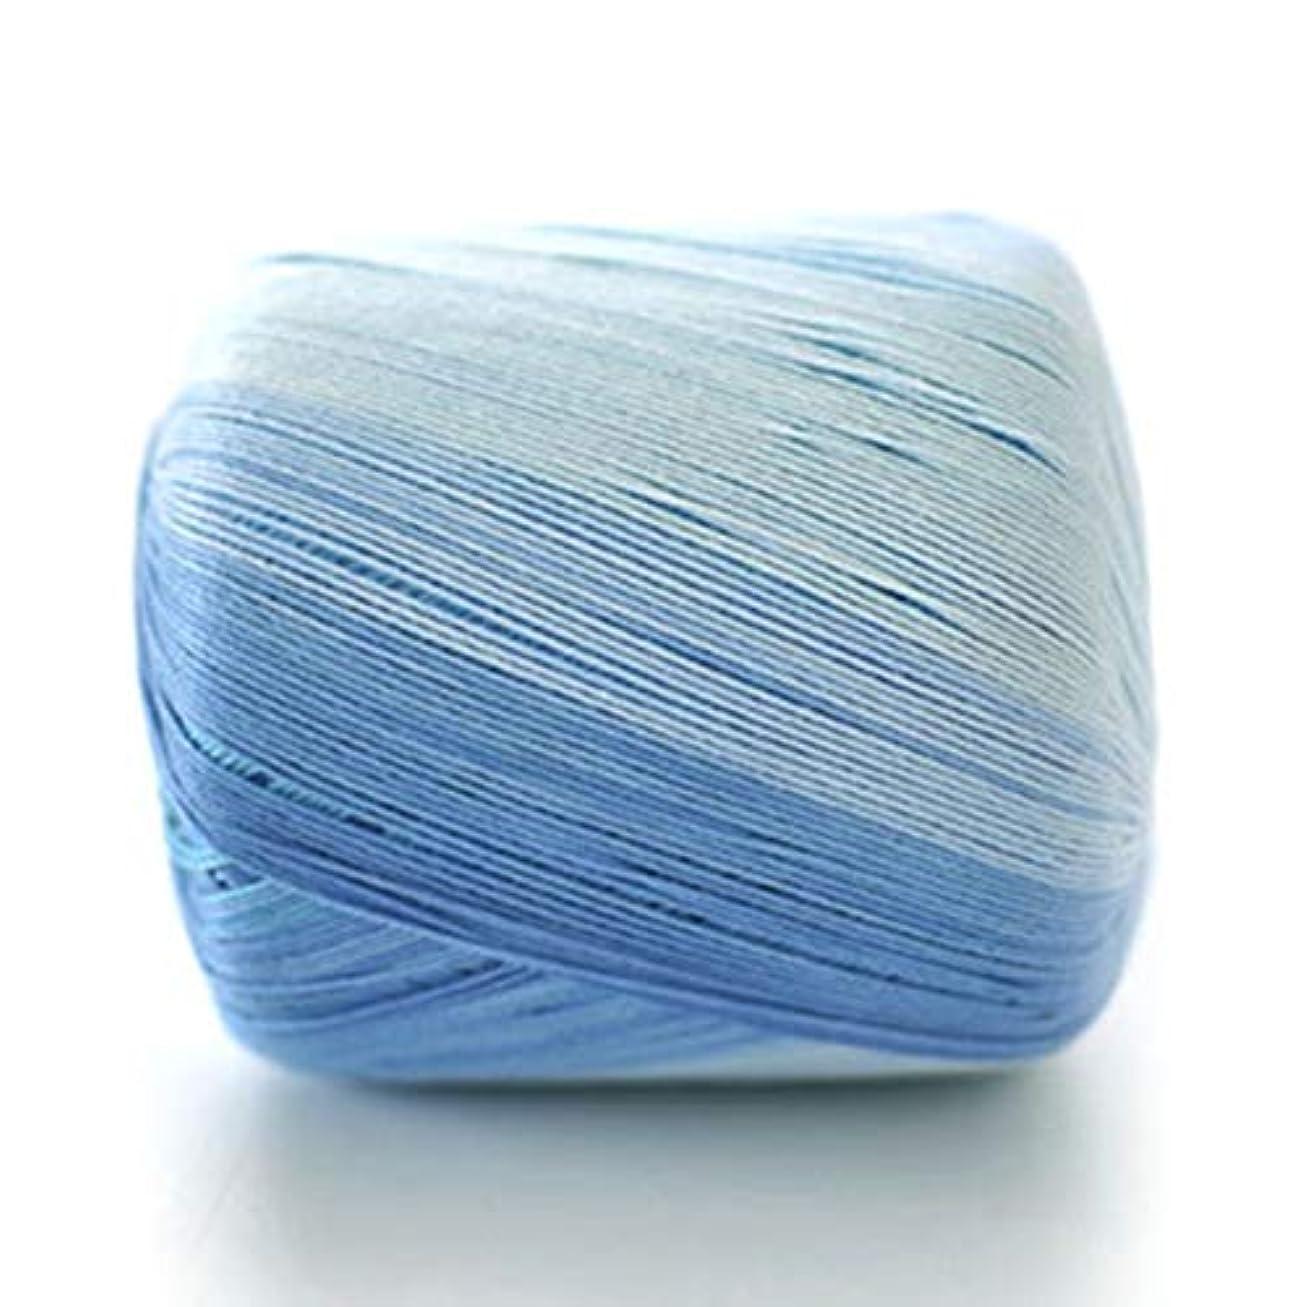 Saikogoods 手作りかぎ針編みのフック糸 色付け レース糸 5号ピュアコットン ファインニットウール ソフト滑らかな 縫製ライン 青